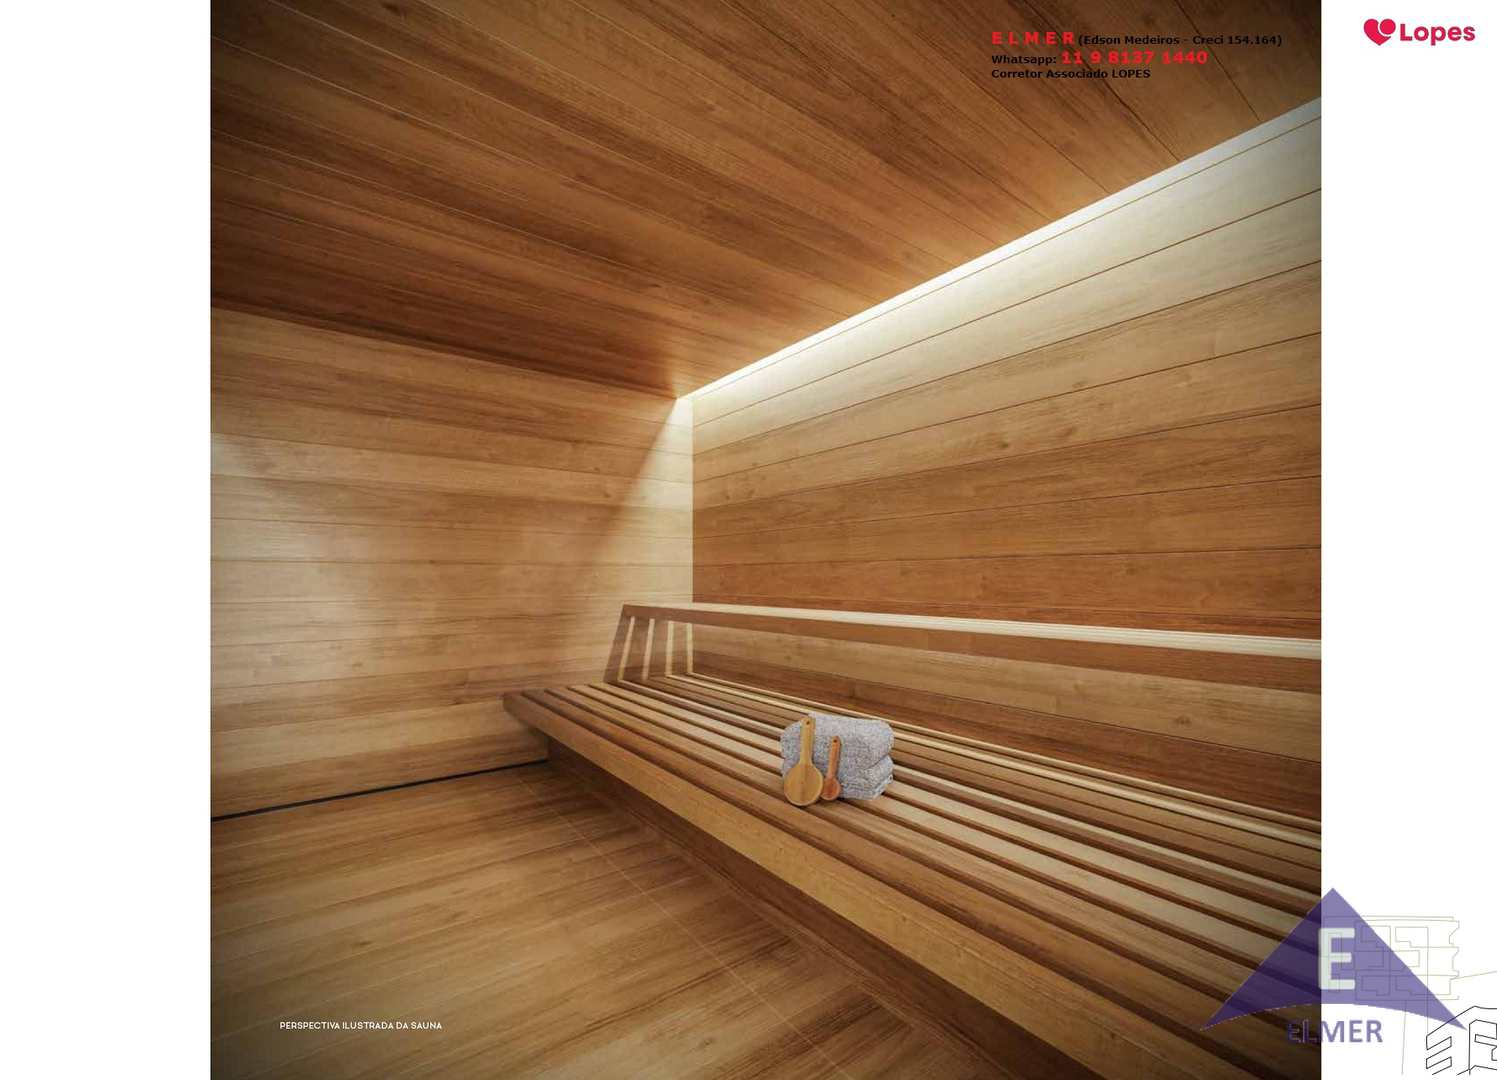 Sauna - HARMONIA DA VILA -Elmer